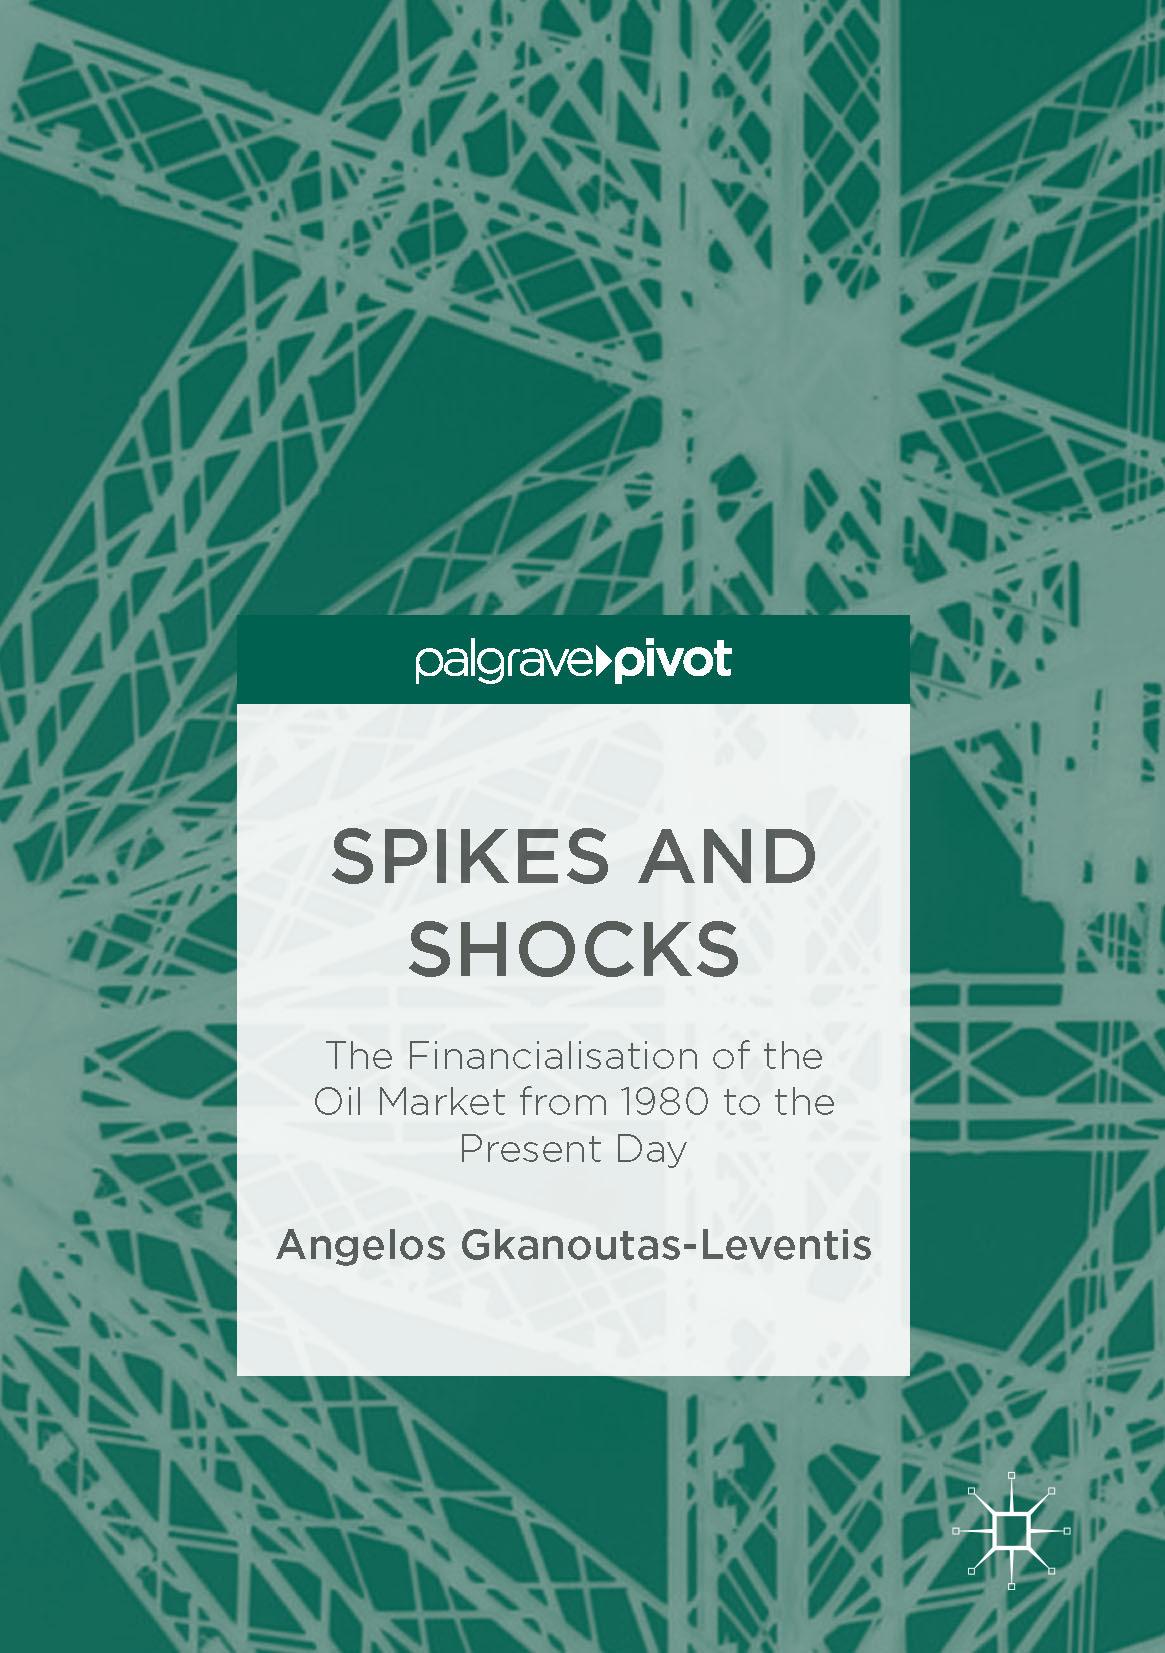 Gkanoutas-Leventis, Angelos - Spikes and Shocks, ebook